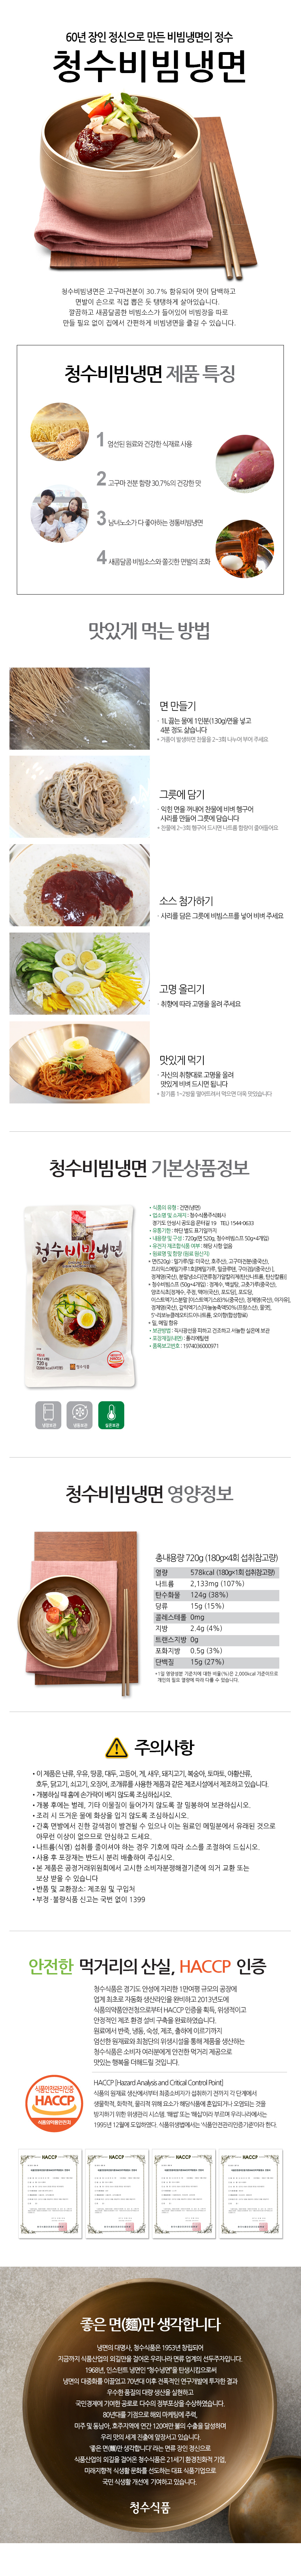 Choung Soo Bibim Naengmyeon (Korean Spicy Cold Noodle) 25.40oz(720g)